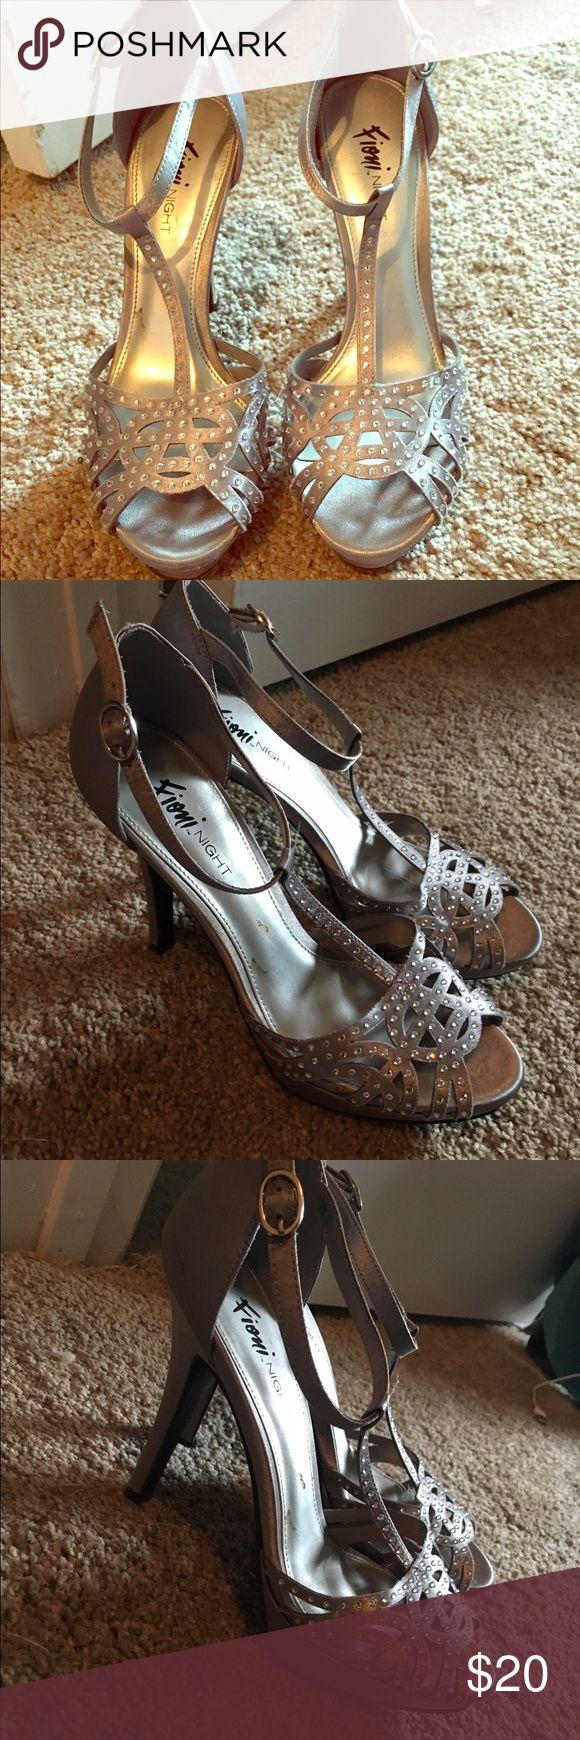 Silver strappy heels Formal strappy rhinestone heels fioni night Shoes Heels